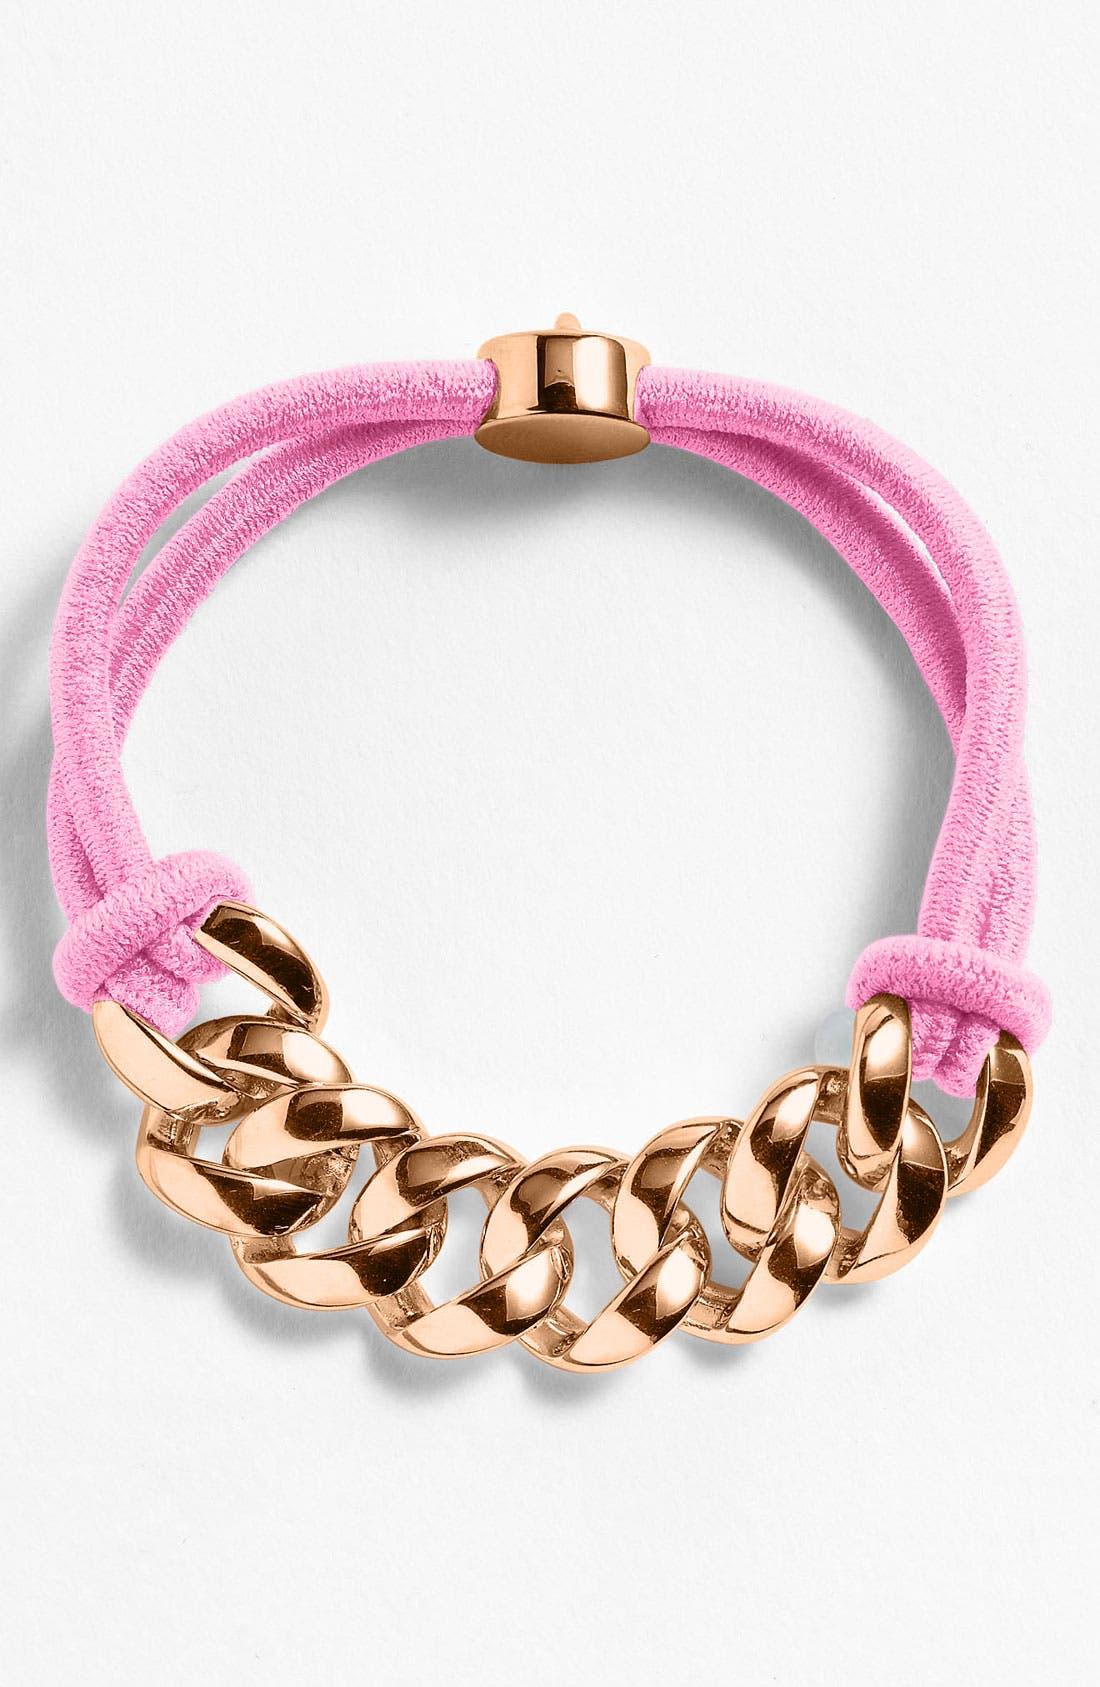 Alternate Image 1 Selected - MARC BY MARC JACOBS 'Turnlock' Cord Bracelet